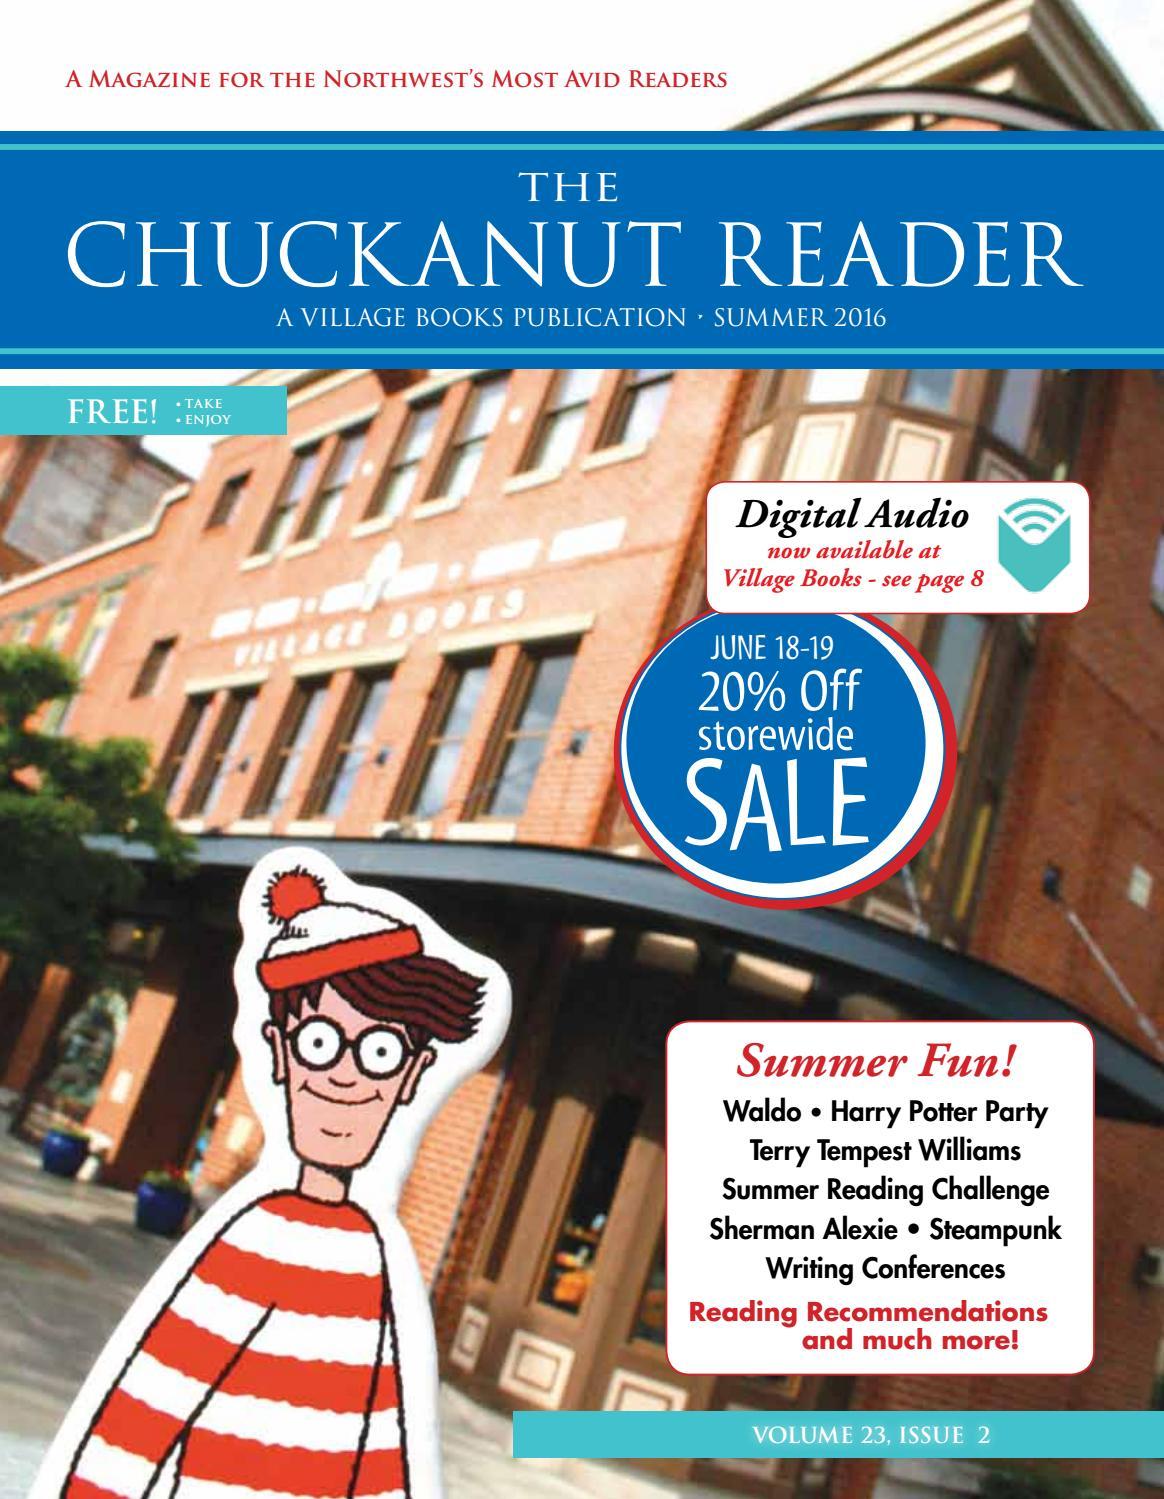 dc563e647fd Chuckanut Reader - Summer 2016 by Village Books   Paper Dreams - issuu